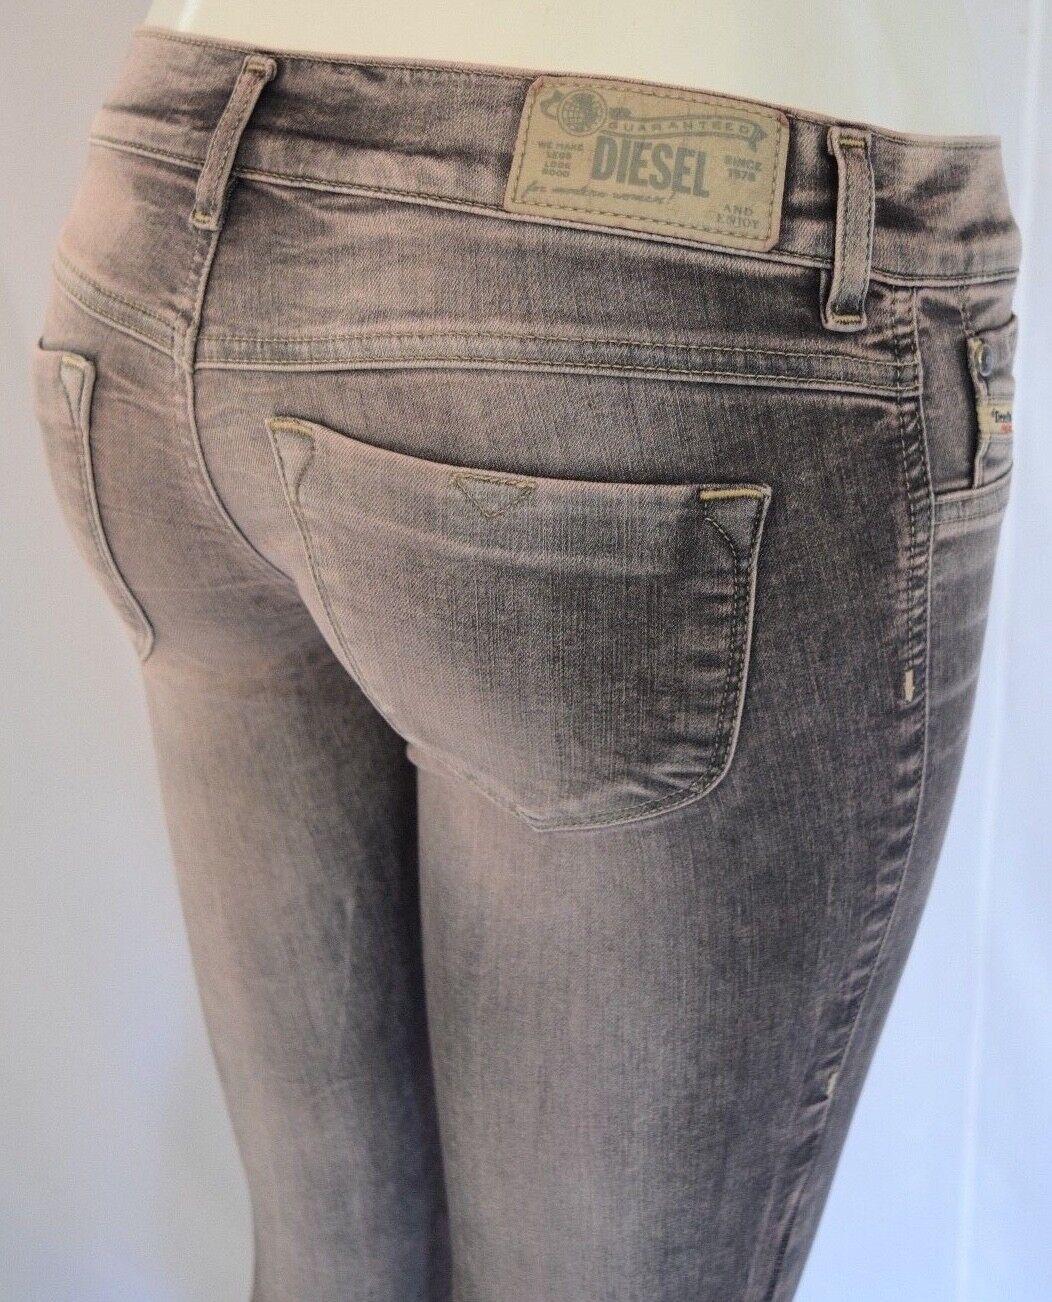 198 DIESEL LIVIER SUPER SLIM JEGGING Jeans Woman SZ 25 in 0602W DOVE GREY